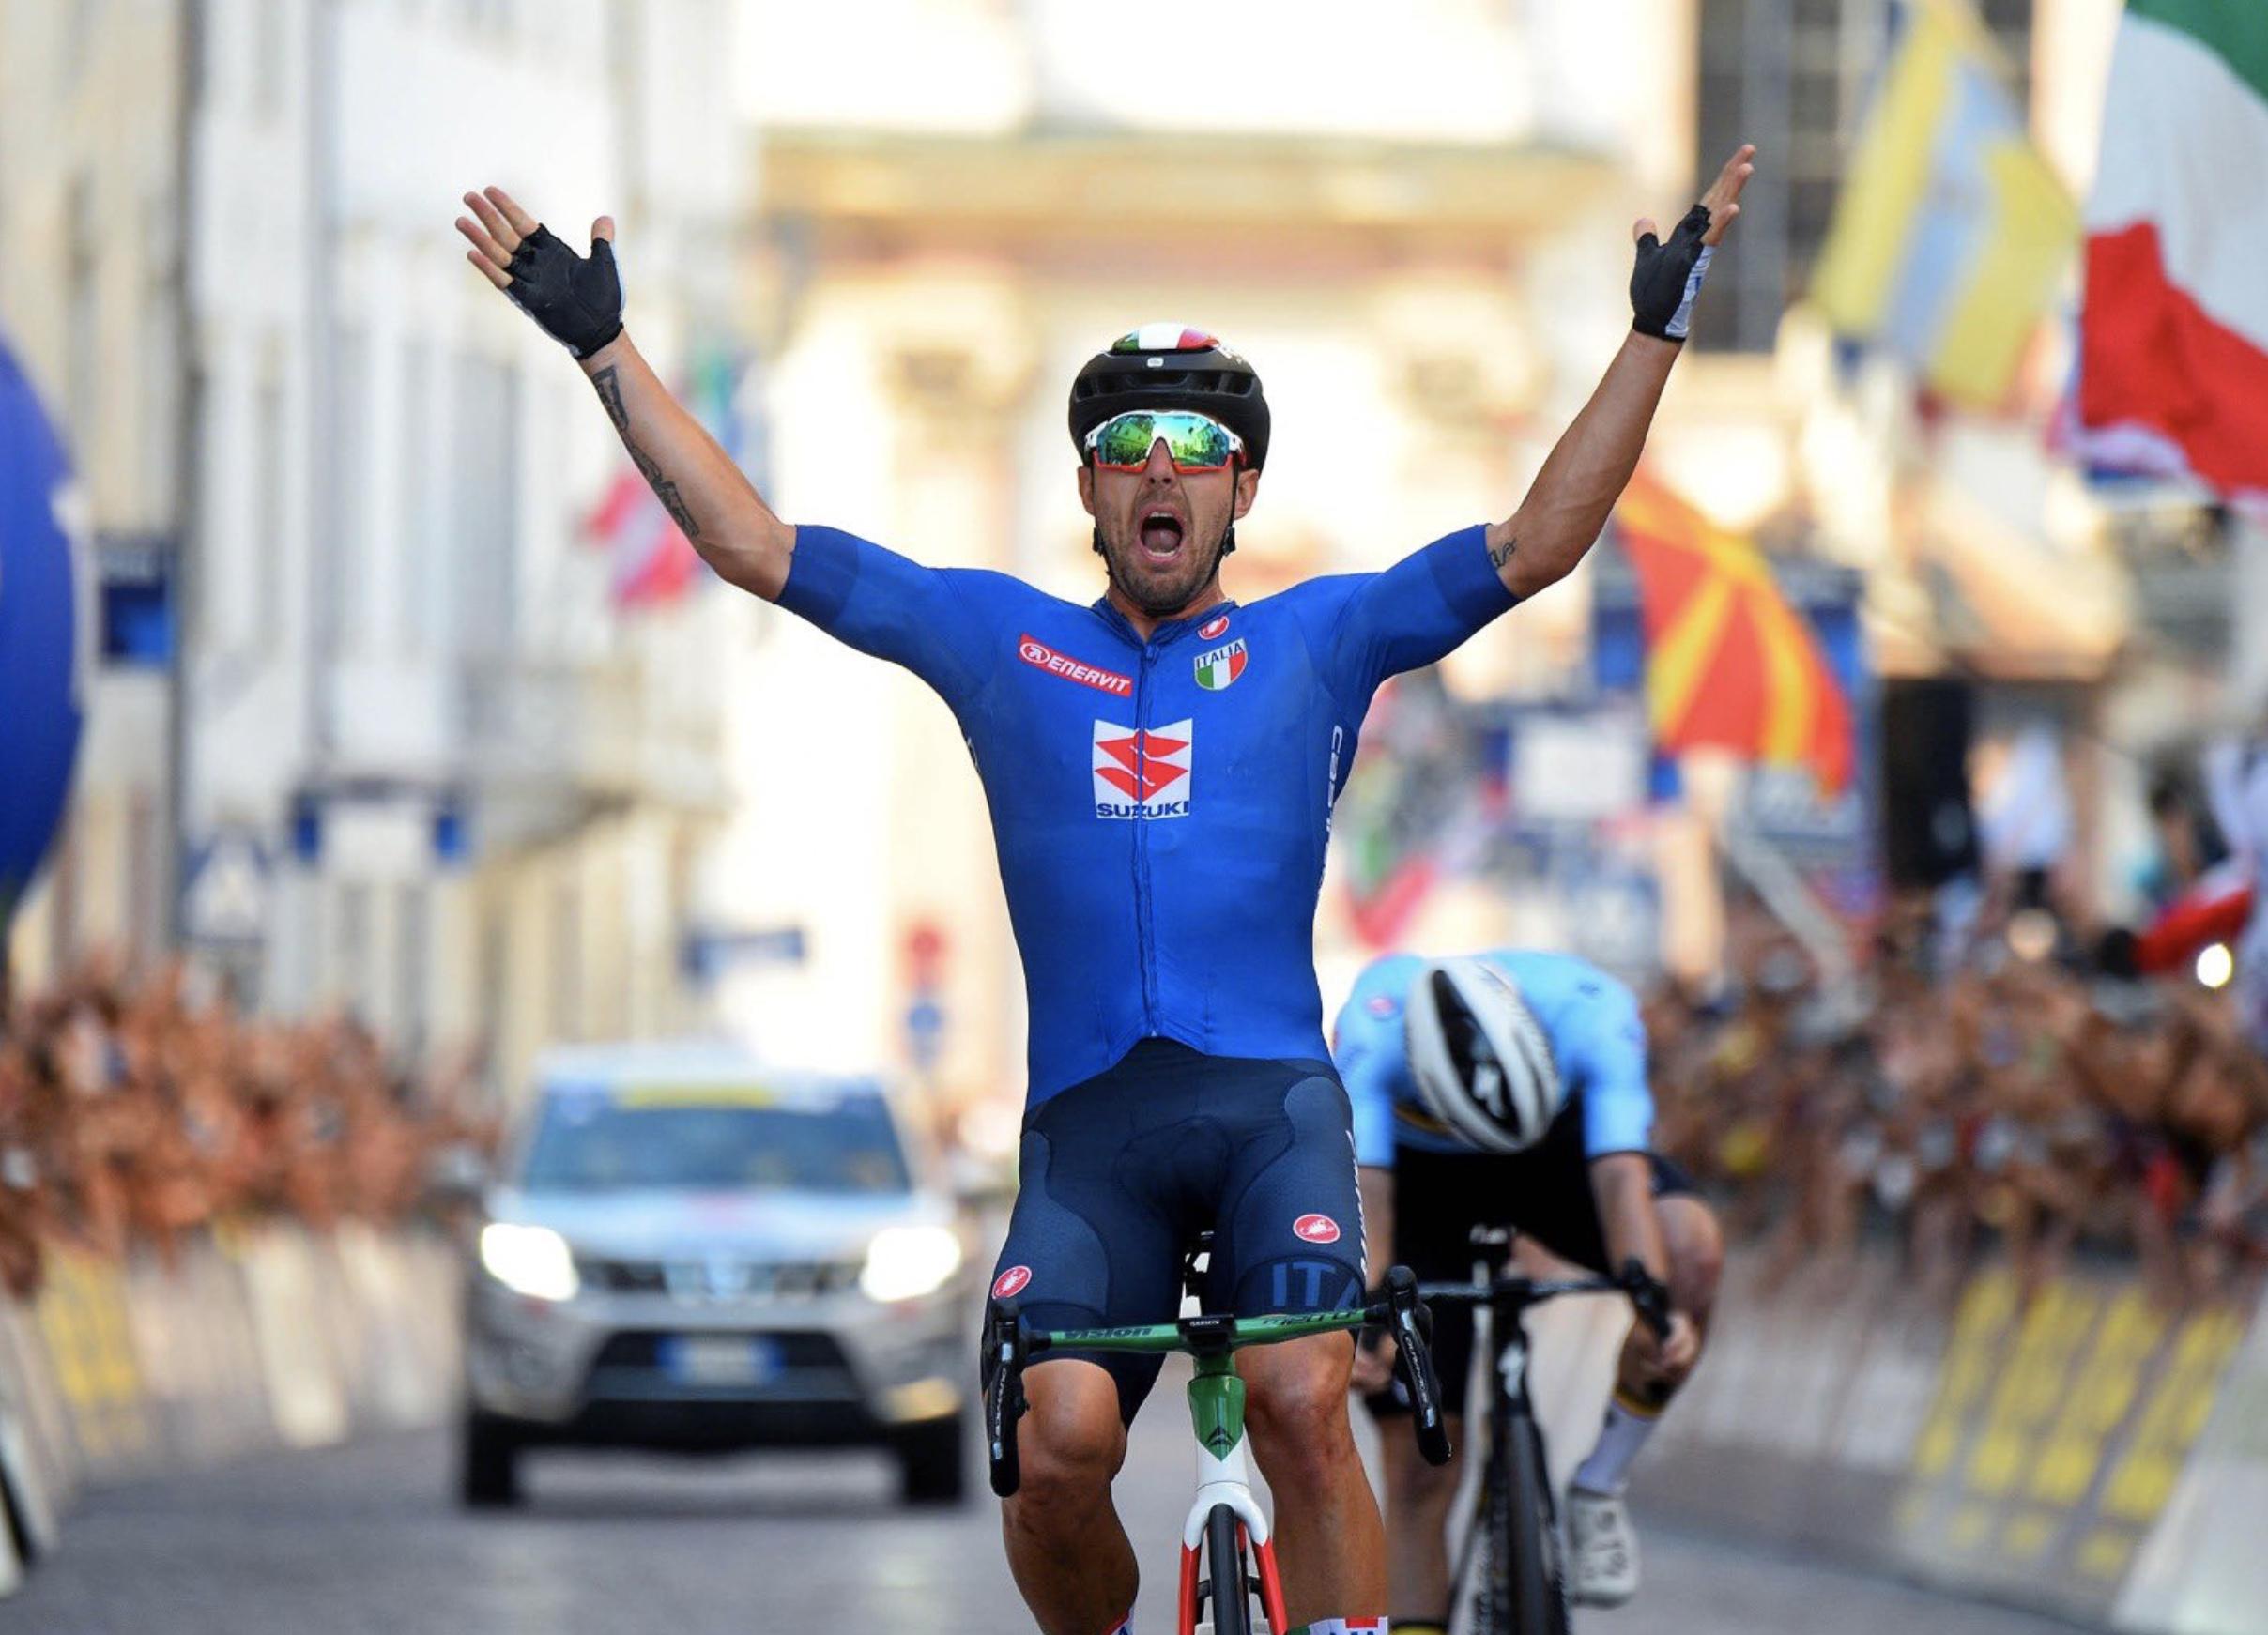 Europei 2021: Sonny Colbrelli campione europeo